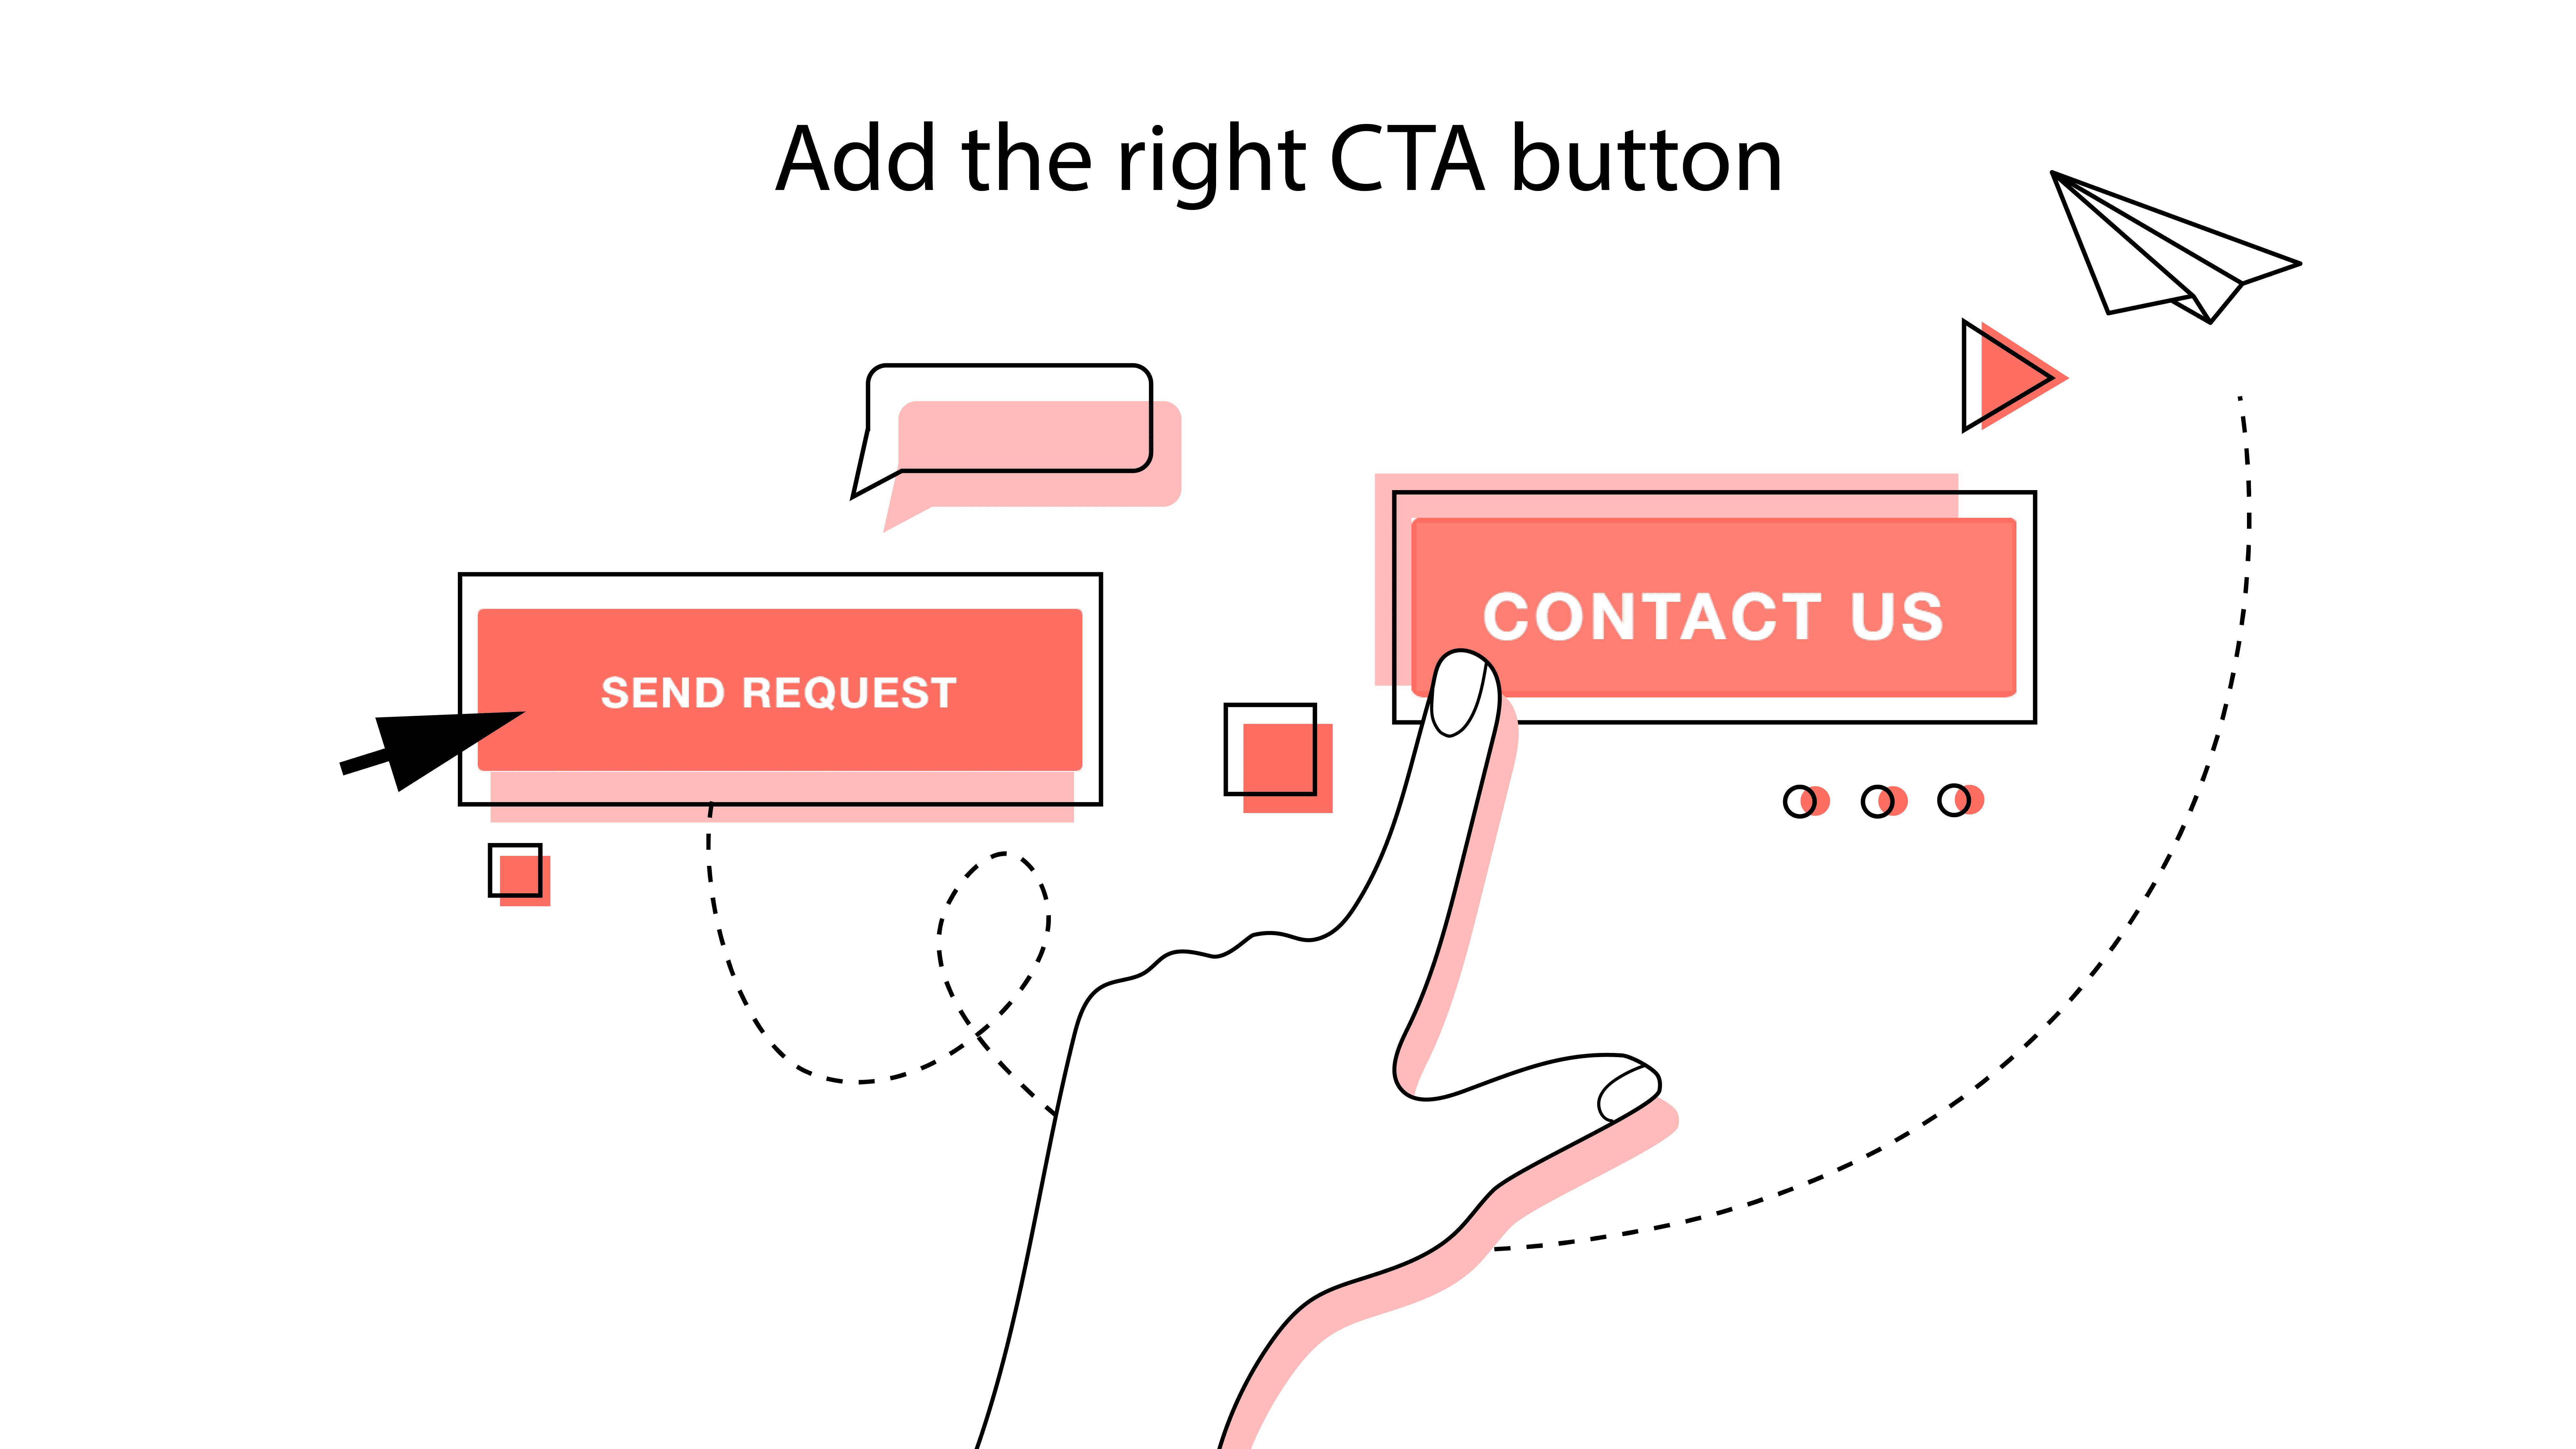 right CTA buttons will make a web design improvement